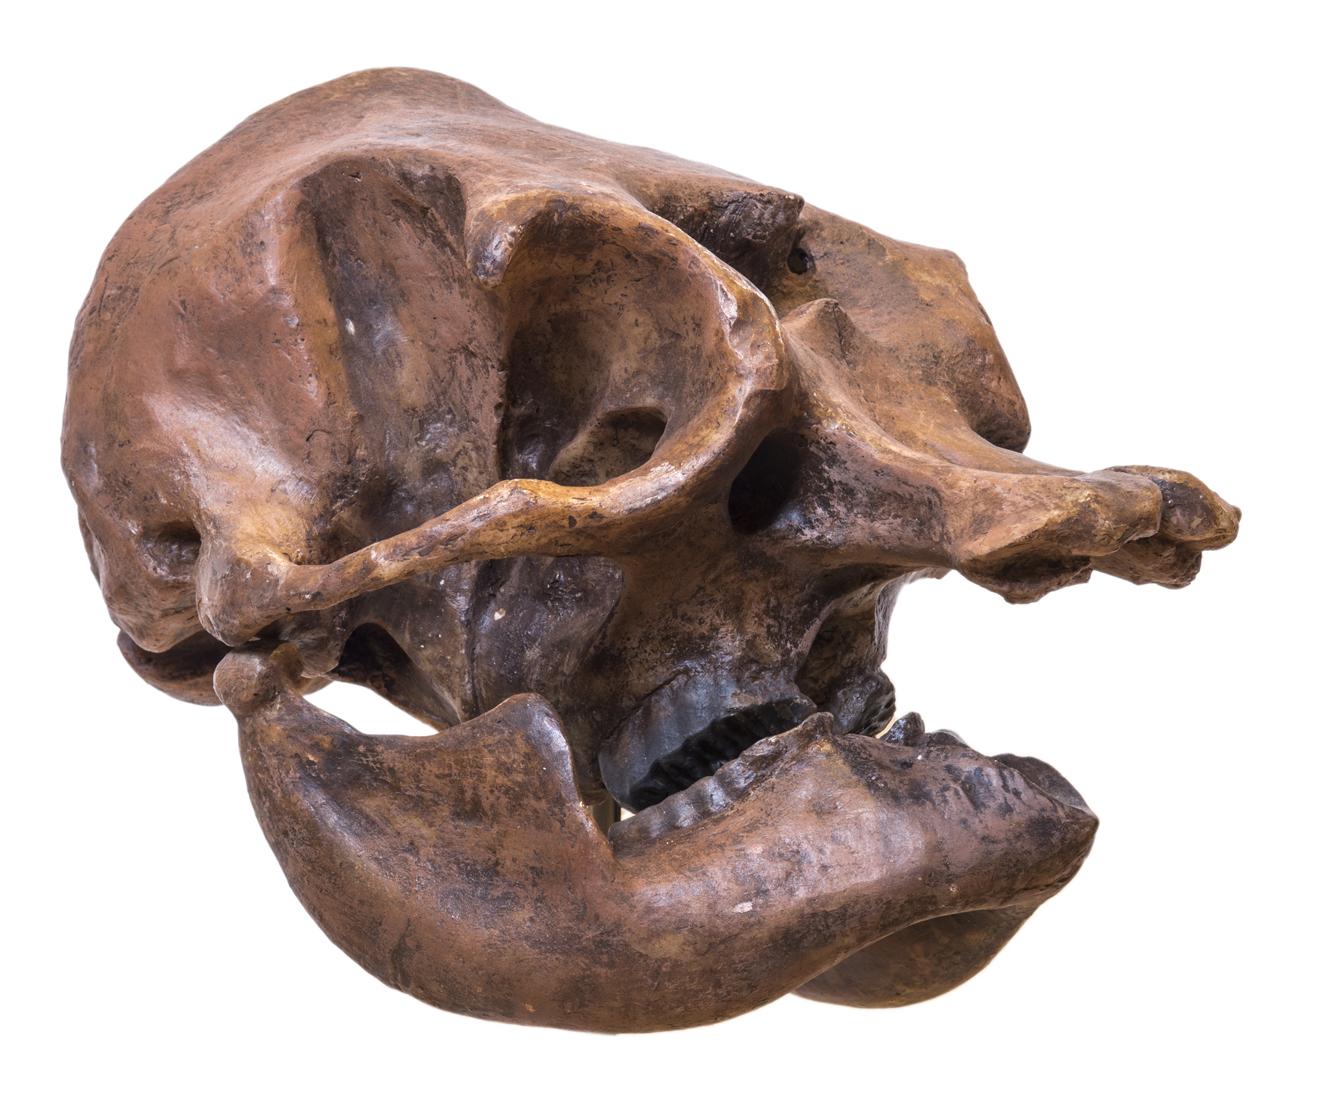 online store 10458 af817 File:Palaeoloxodon falconeri - skull - MUSE.jpg - Wikimedia ...